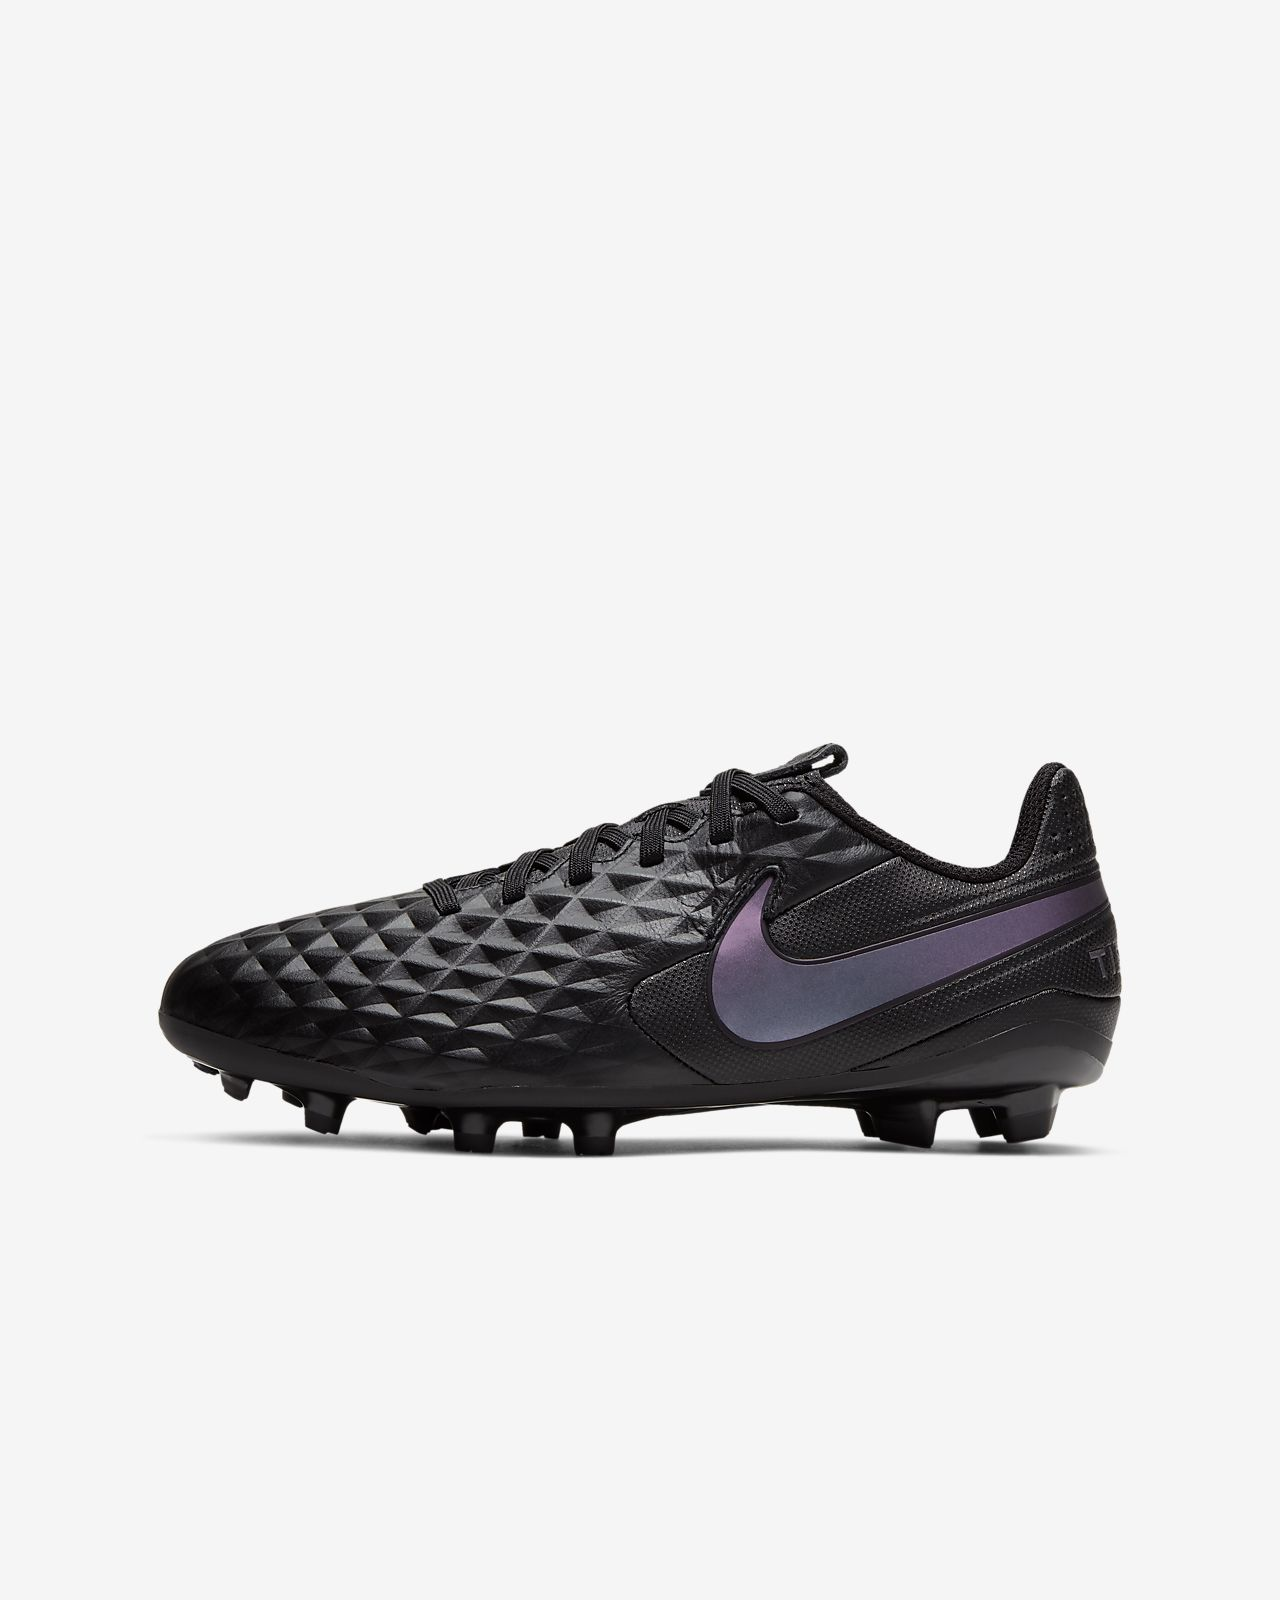 new nike junior football boots